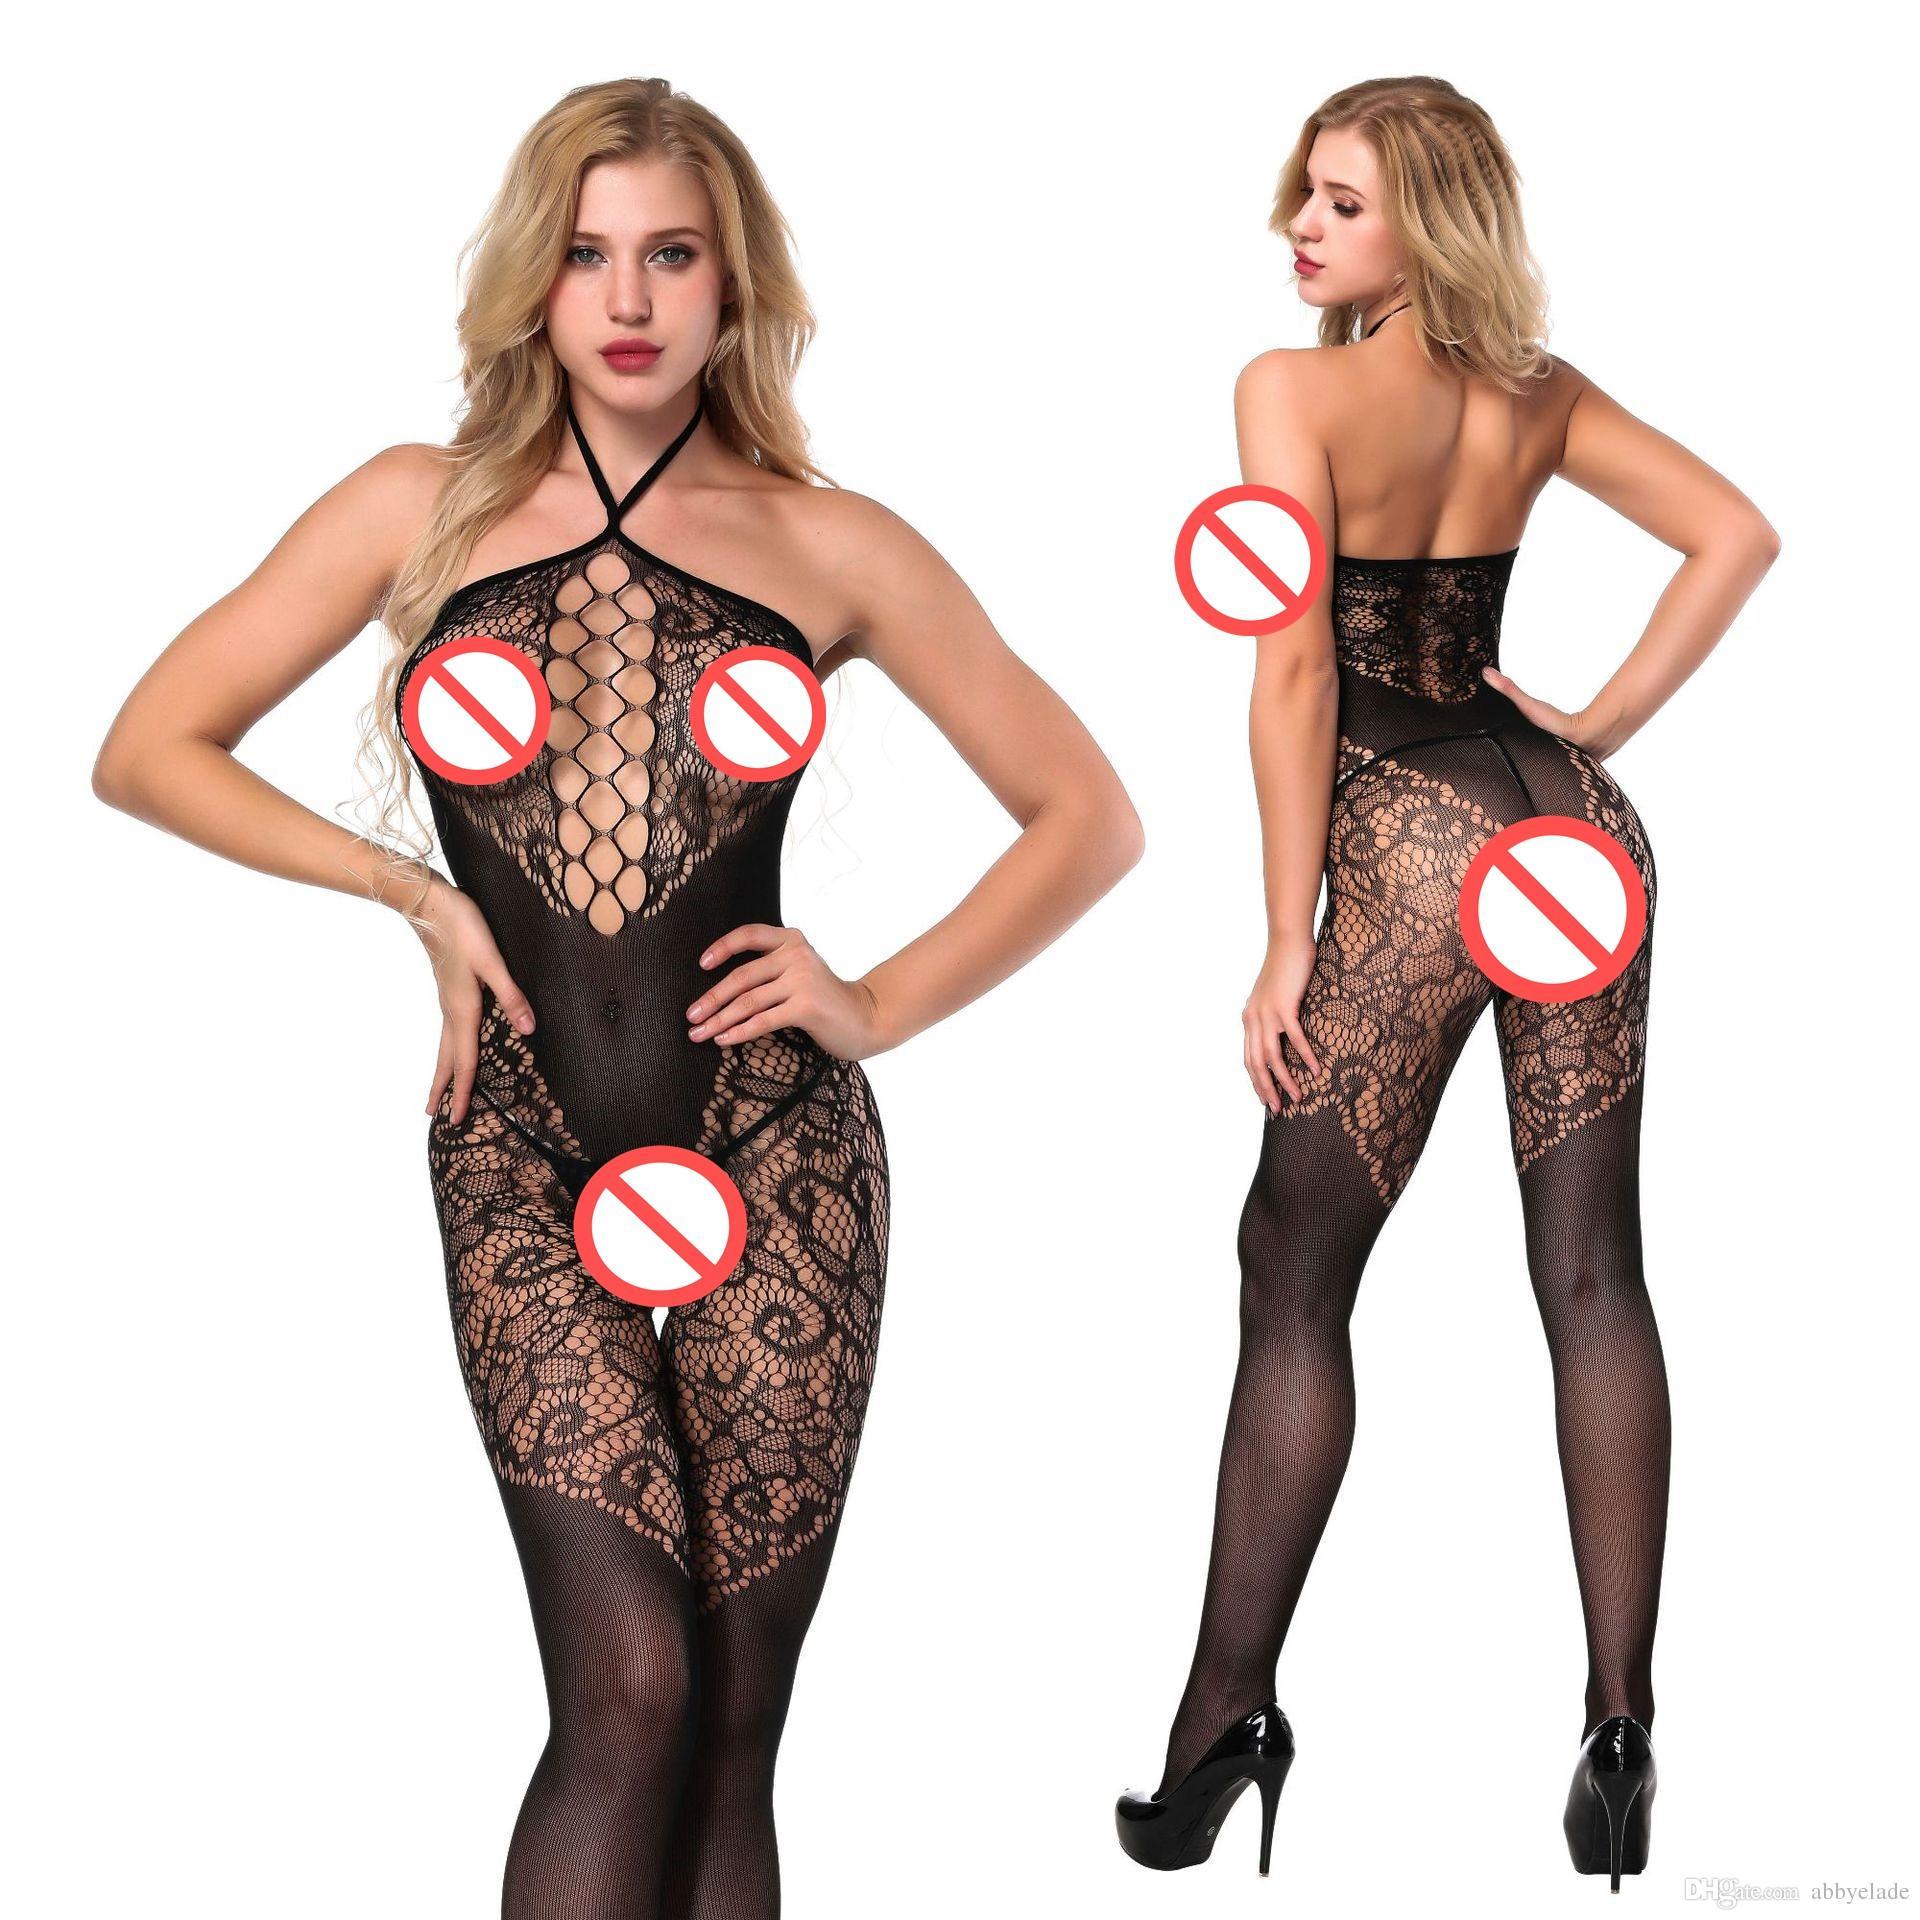 053105e2595 2019 2018 New Sexy Women Sexy Lingerie Hot Sleepwear Catsuit Seamless Open  Crotch Opaque Tattoo Halter Neck Bodystocking From Abbyelade